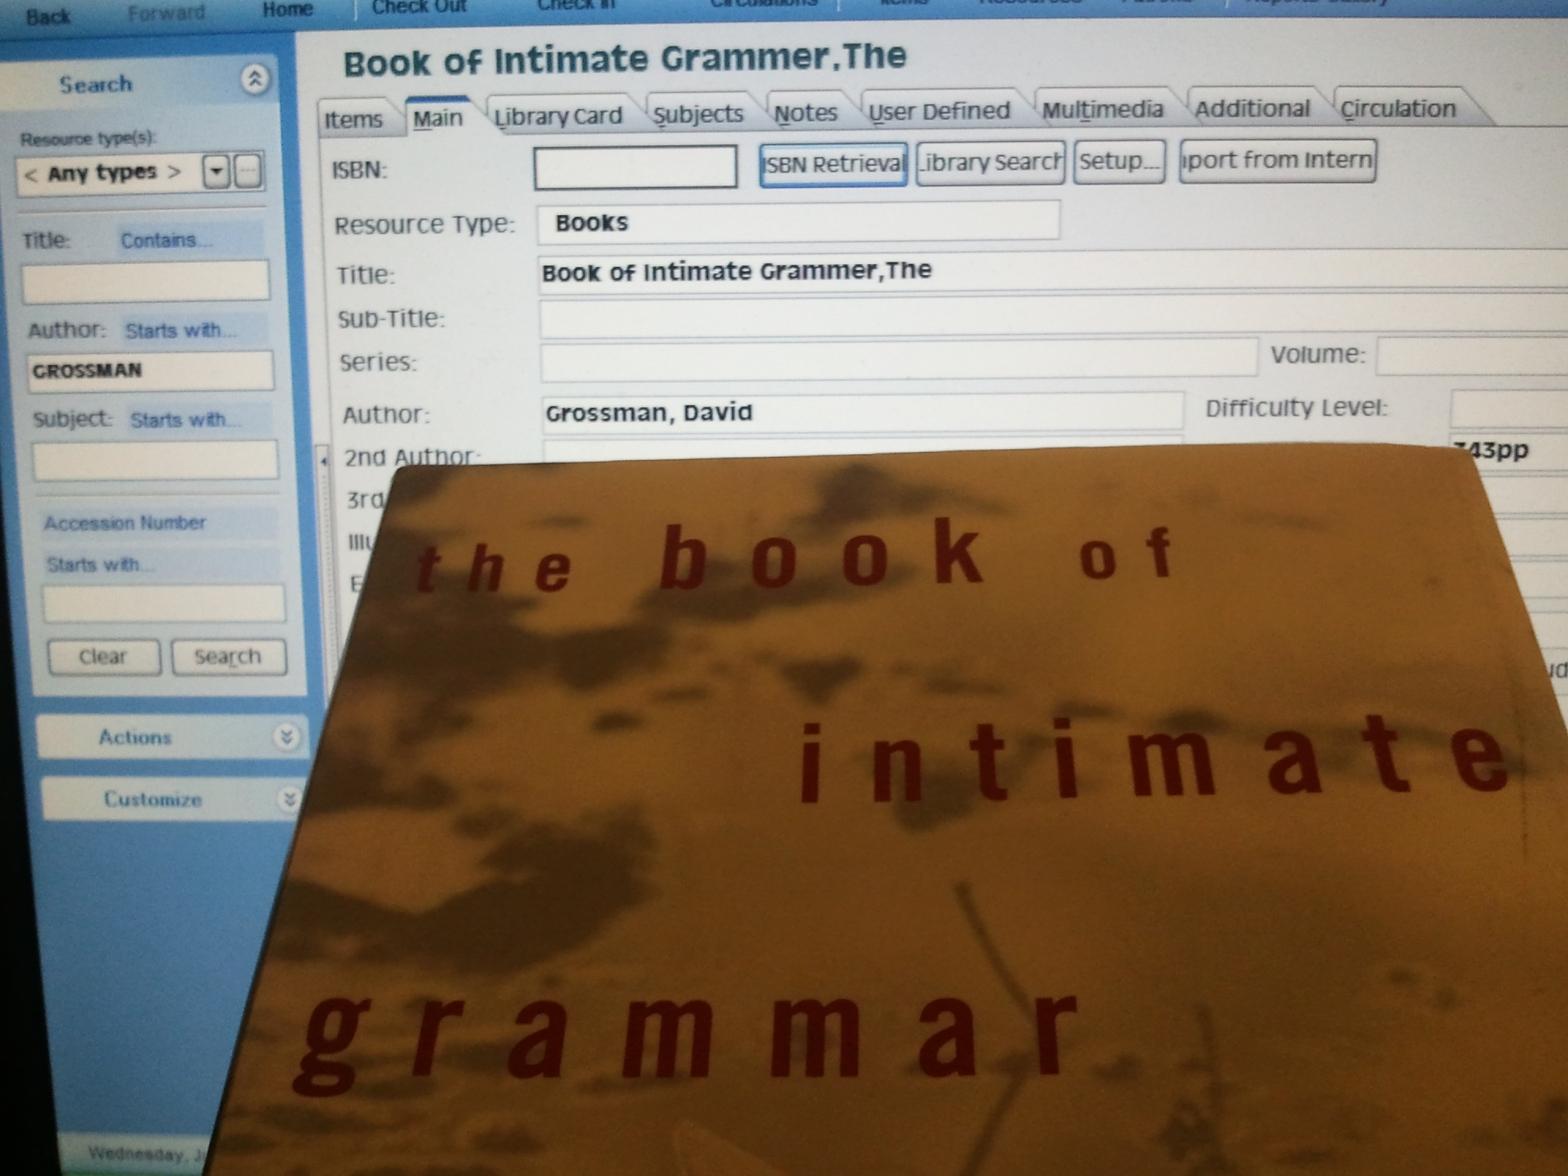 The Book of Intimate Grammar, By David Grossman